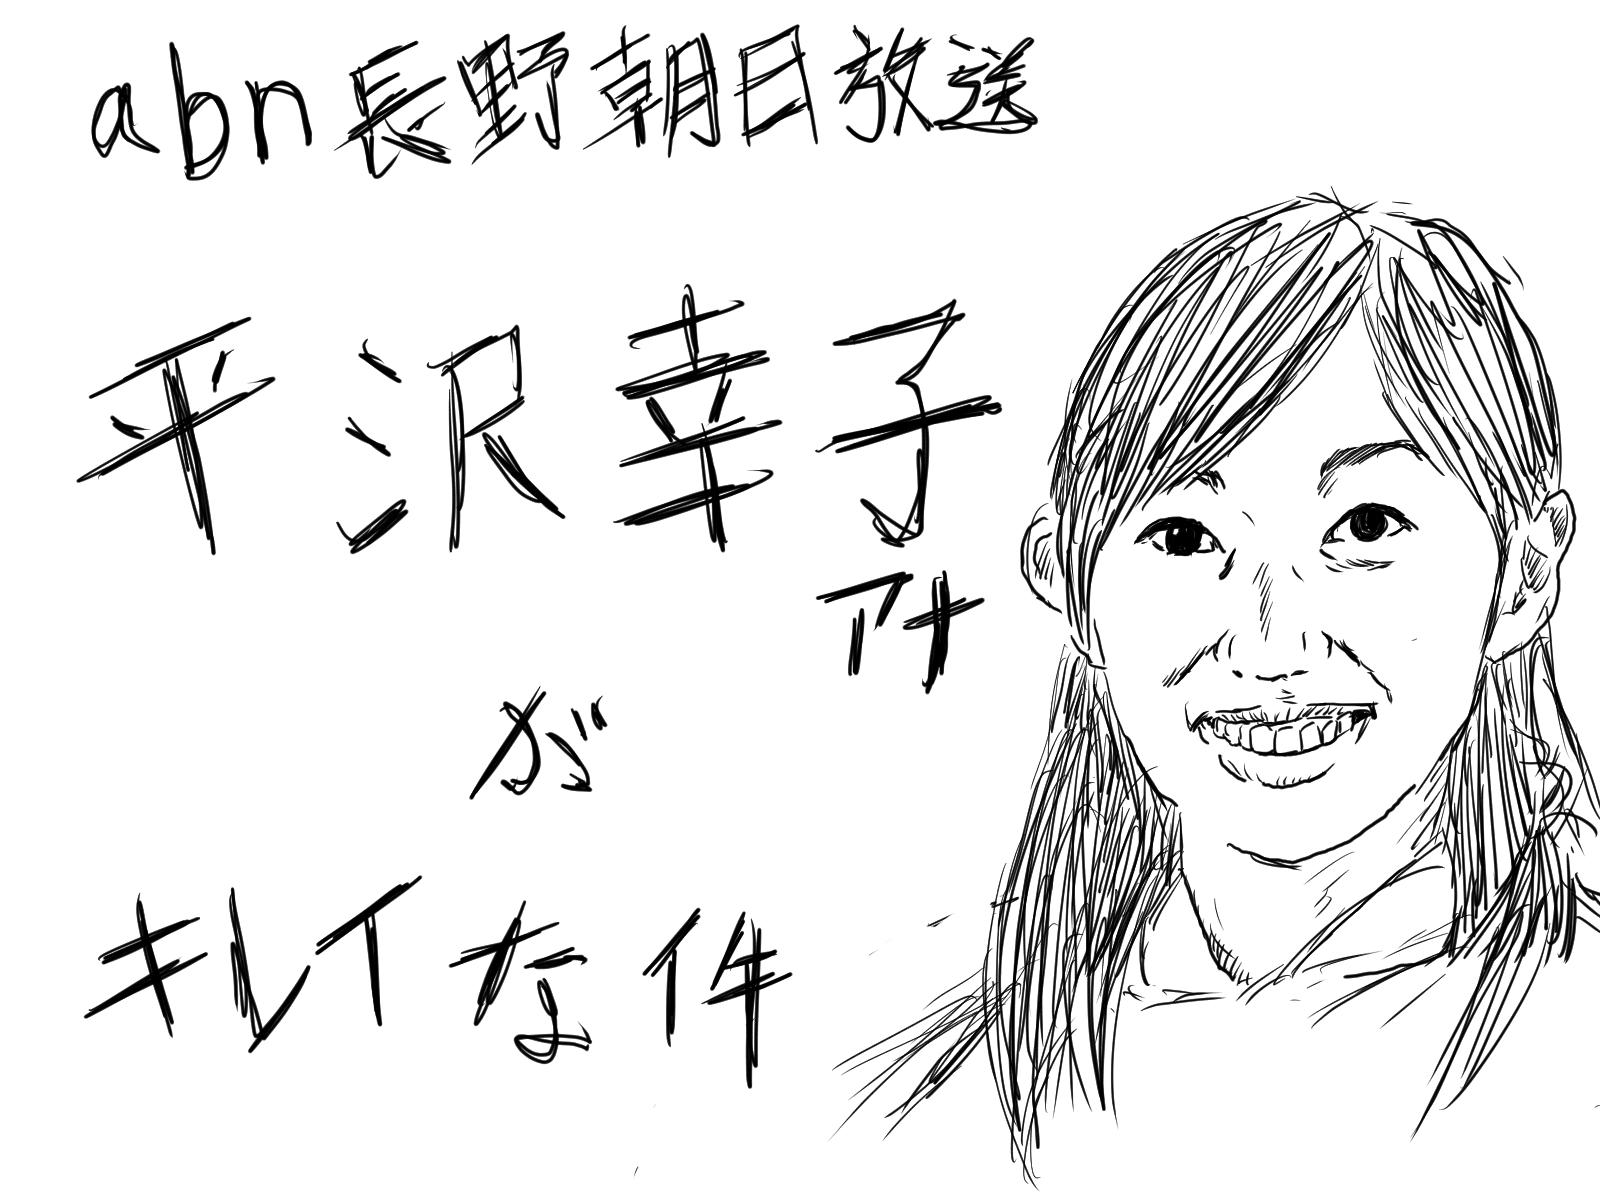 【abn長野朝日放送】平沢幸子アナウンサーがきれいな件